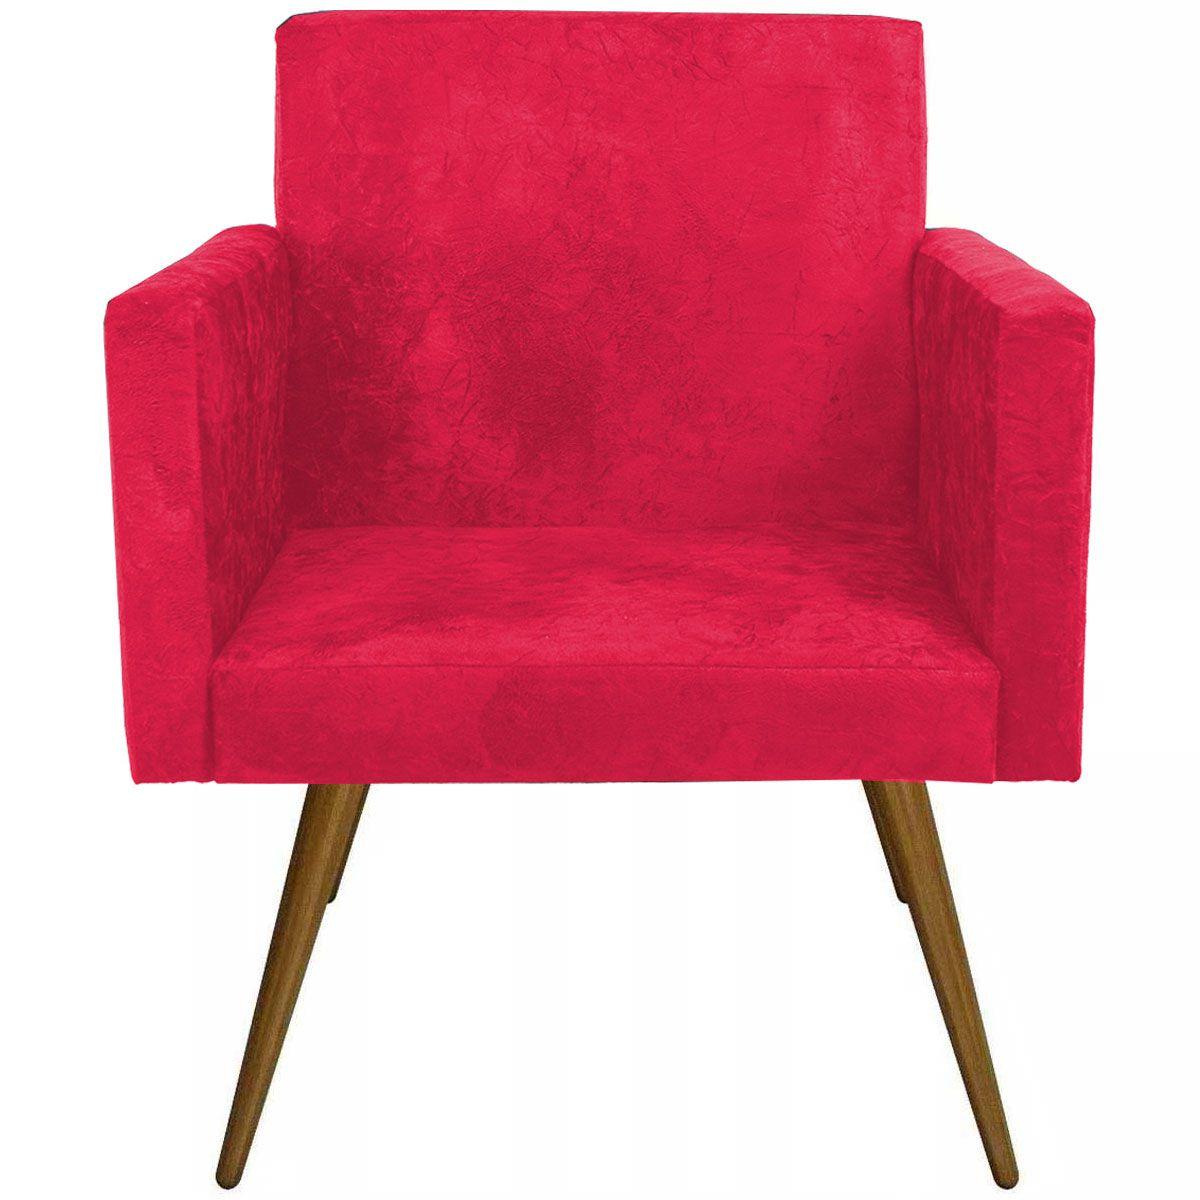 Poltrona Decorativa Nina Luxo Pés Palito Tecido Vermelho